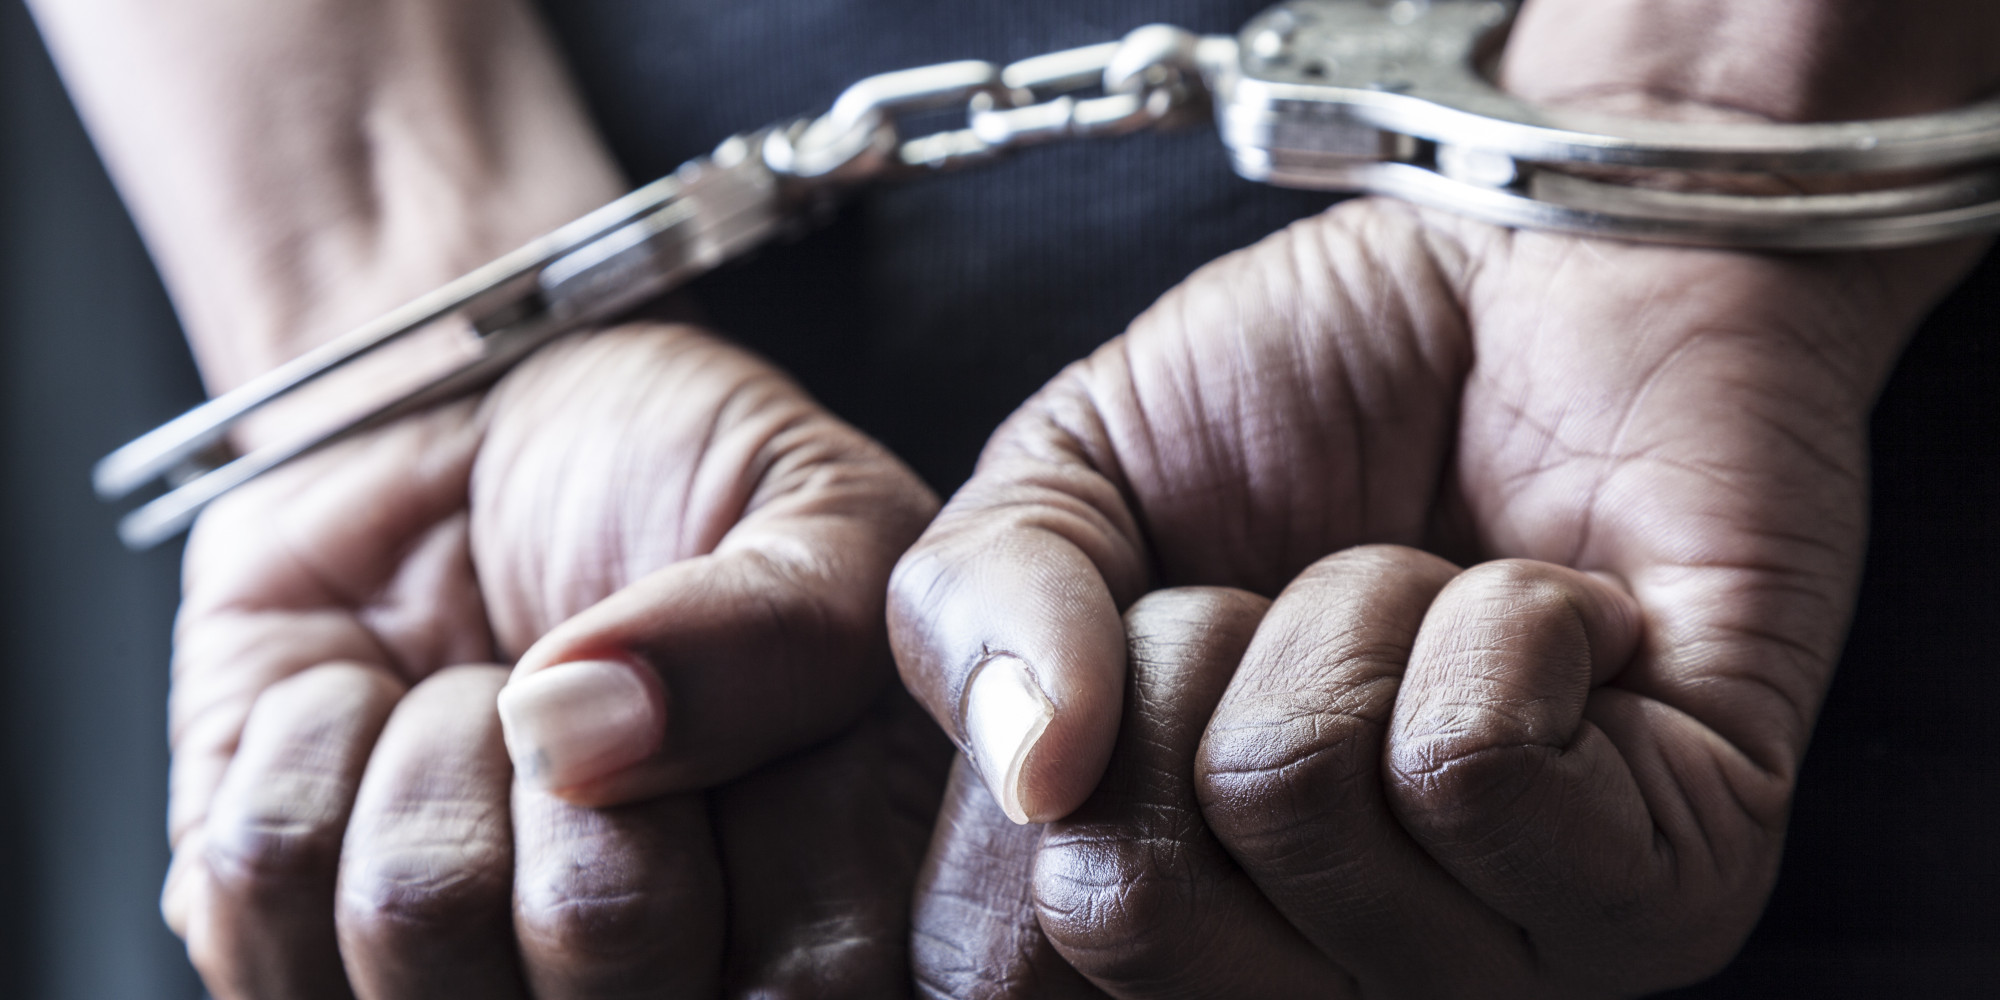 Man arrested after 400-gallon moonshine still found at Alabama home